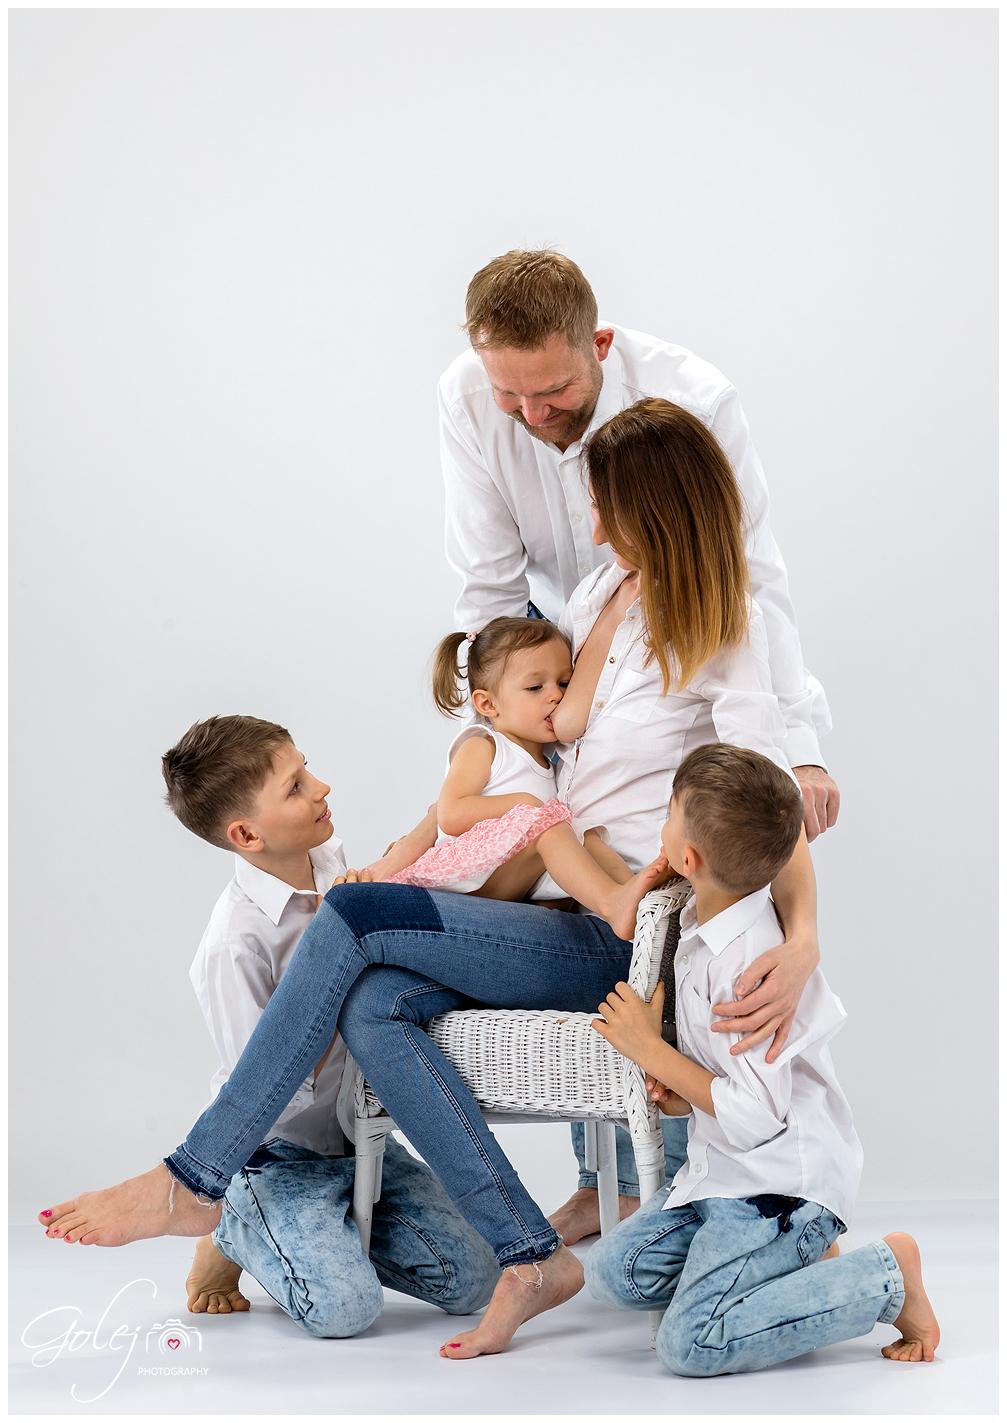 Zdrave dojcenie